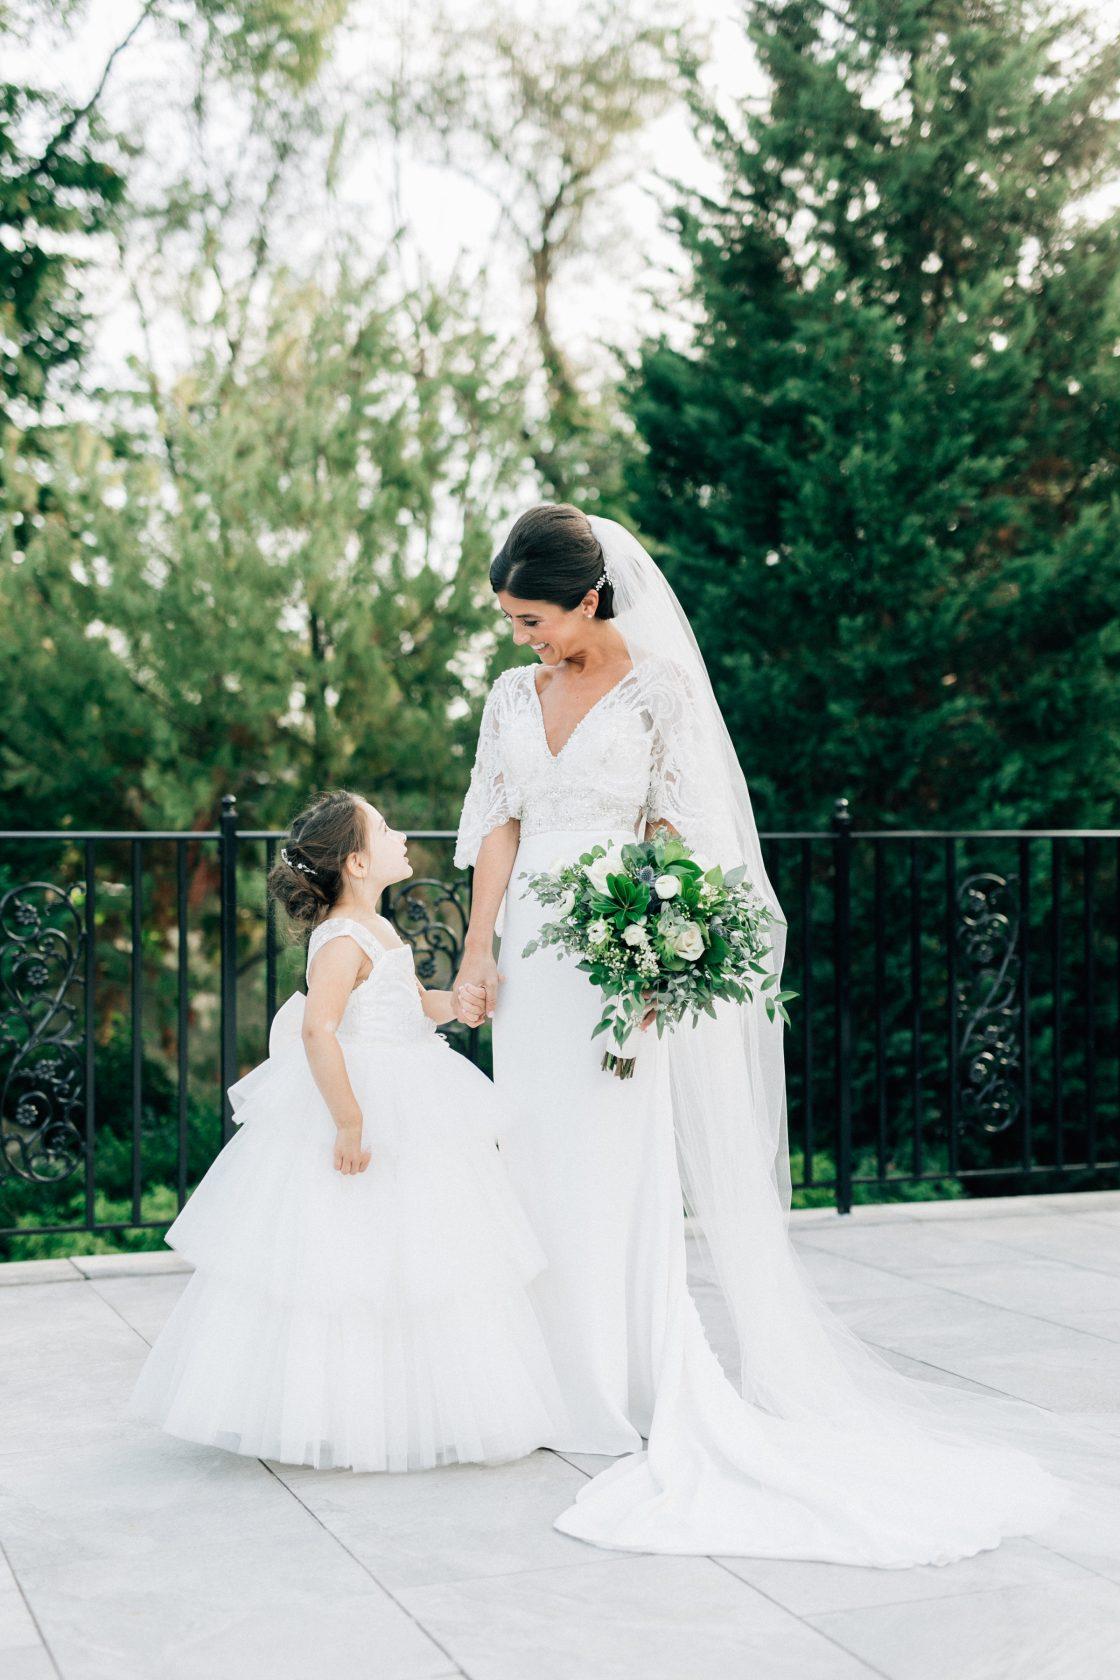 Elegant New Jersey Wedding with Greenery 63